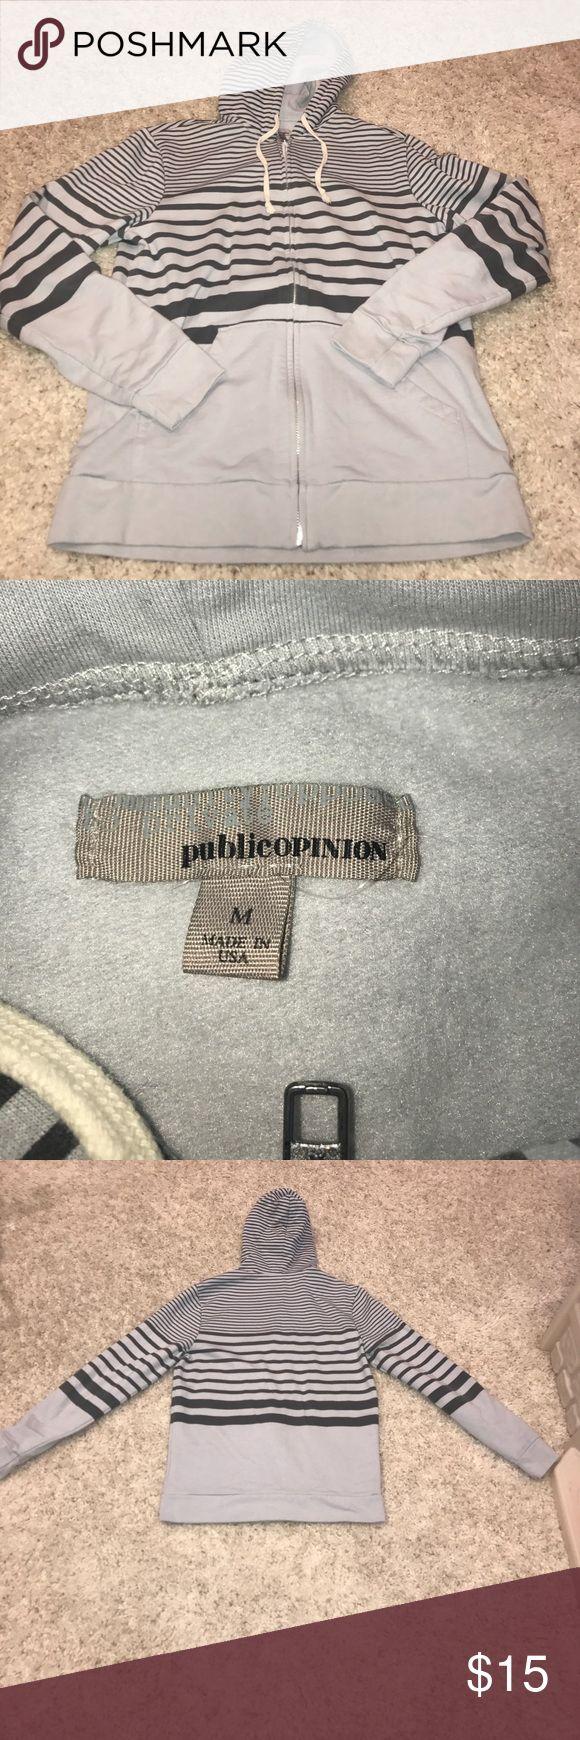 Public Opinion Striped Hoodie Men's Striped Hoodie Grey and Black super soft Public Opinion Shirts Sweatshirts & Hoodies